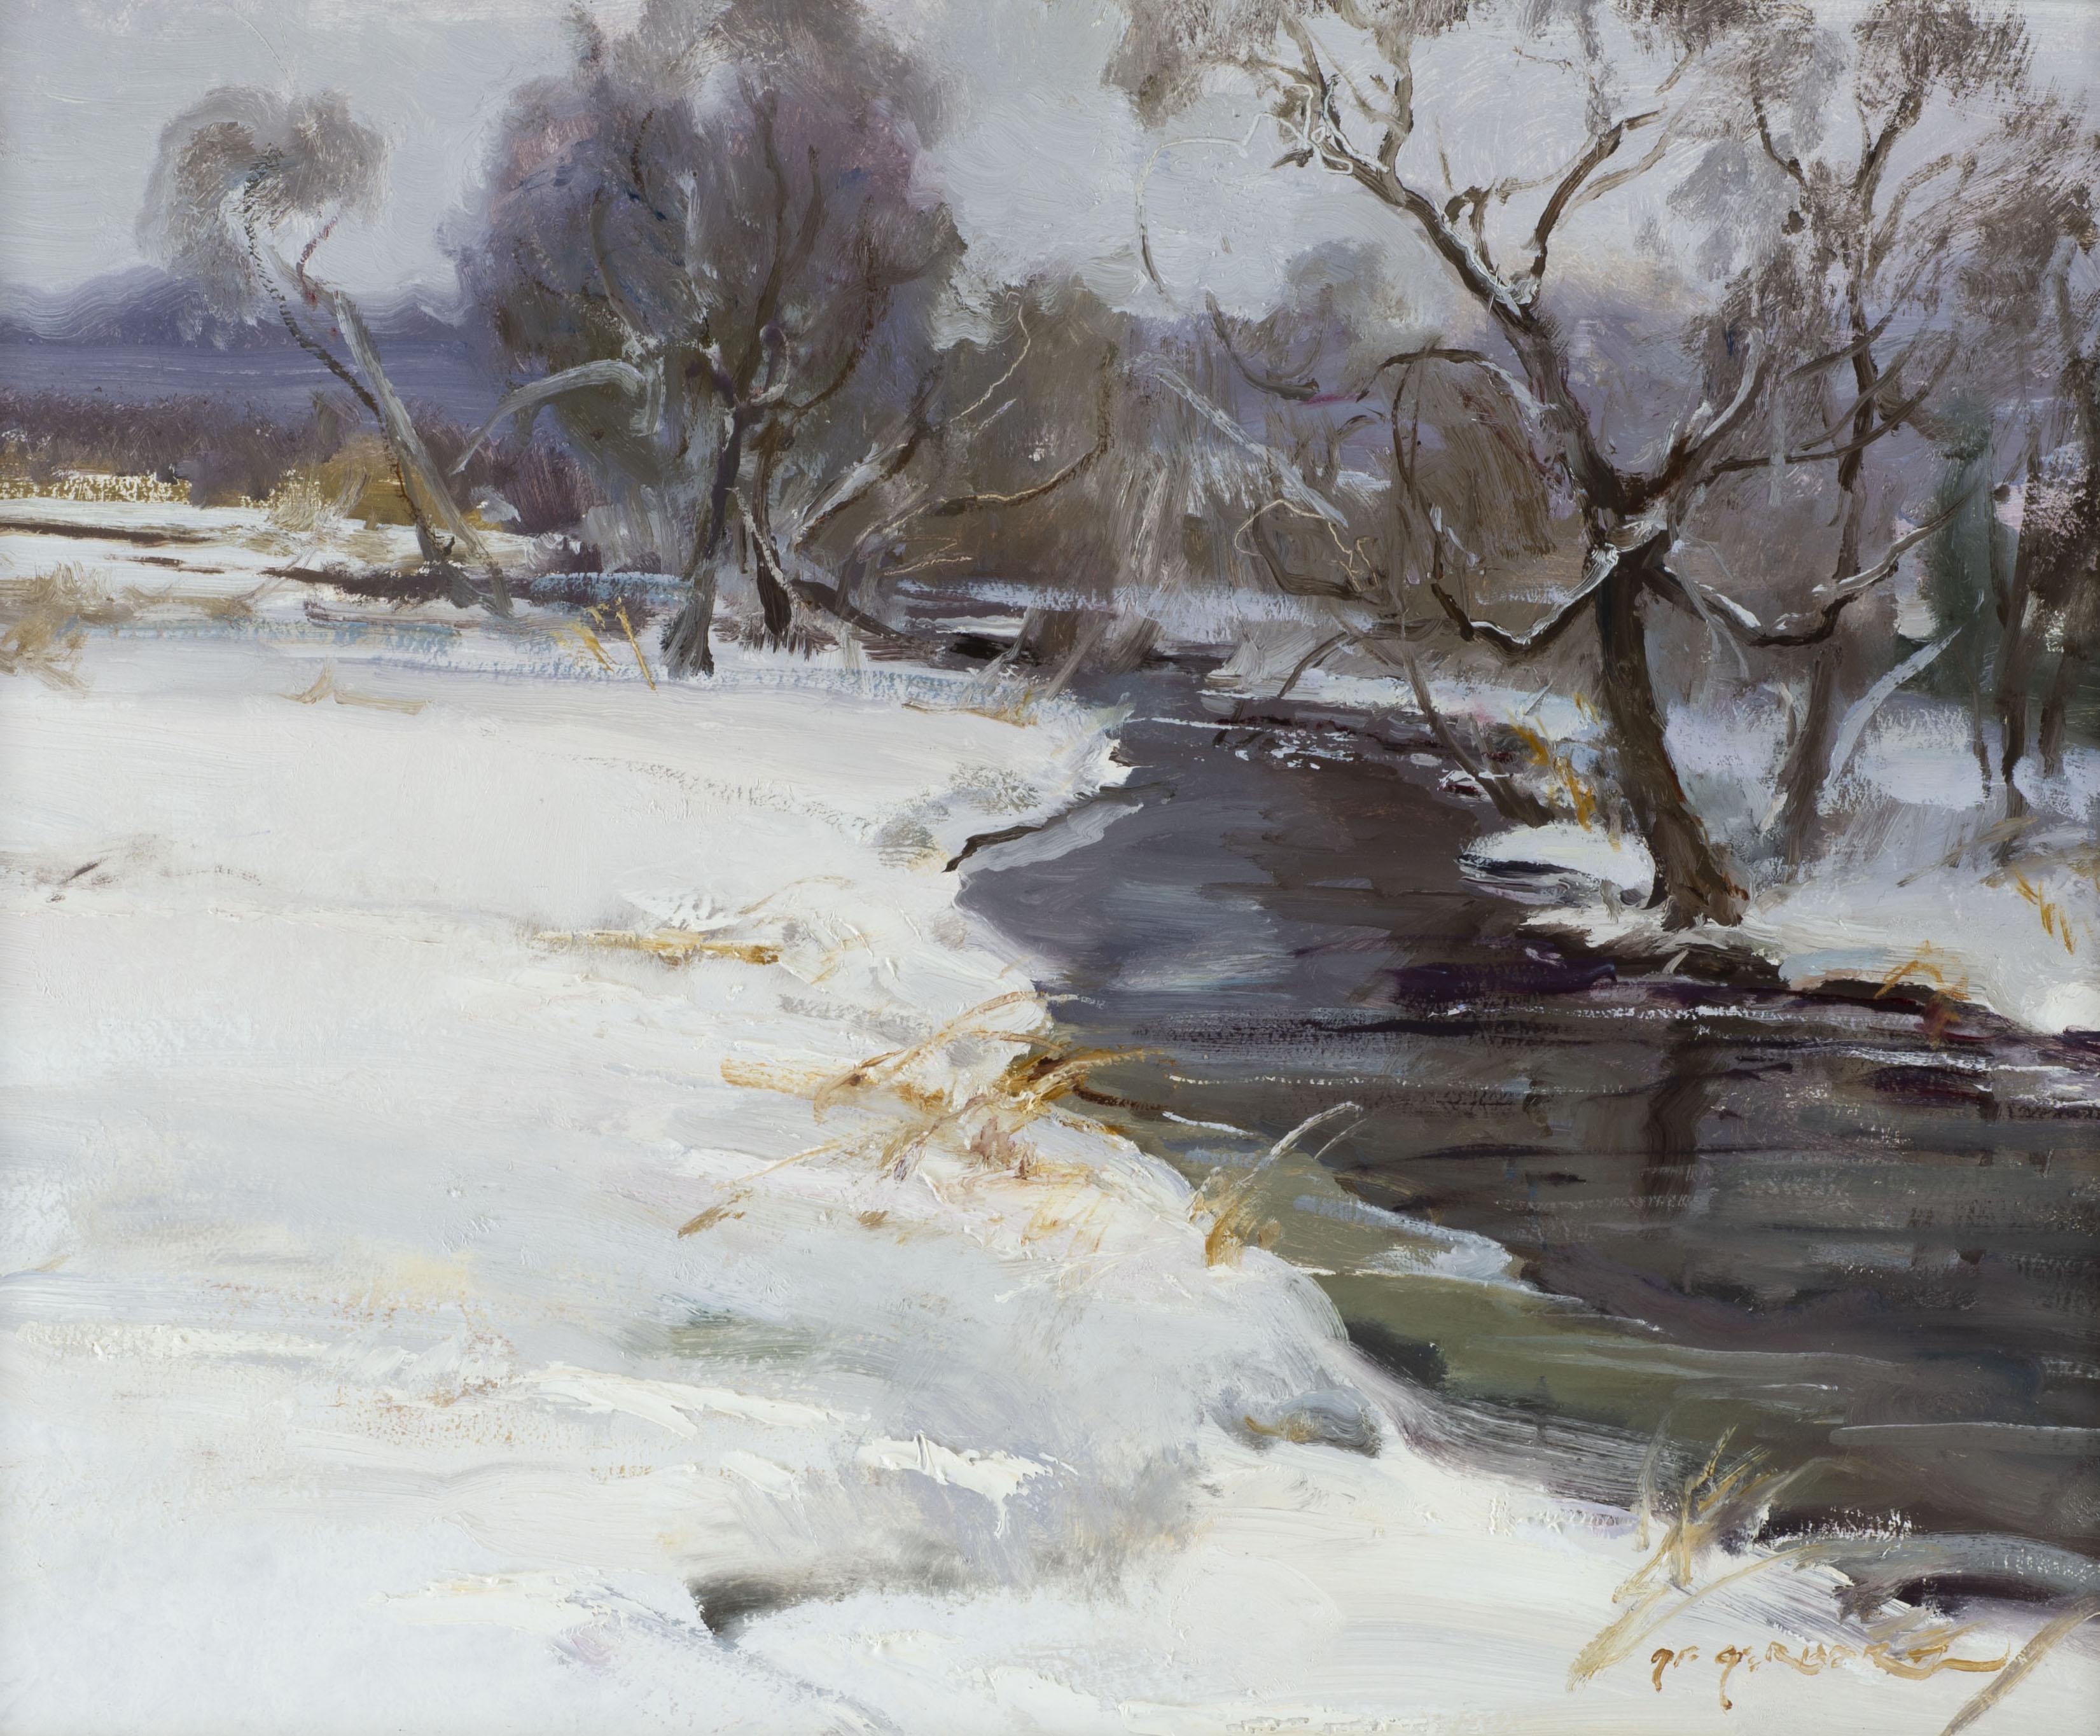 Winter's Final Blanket